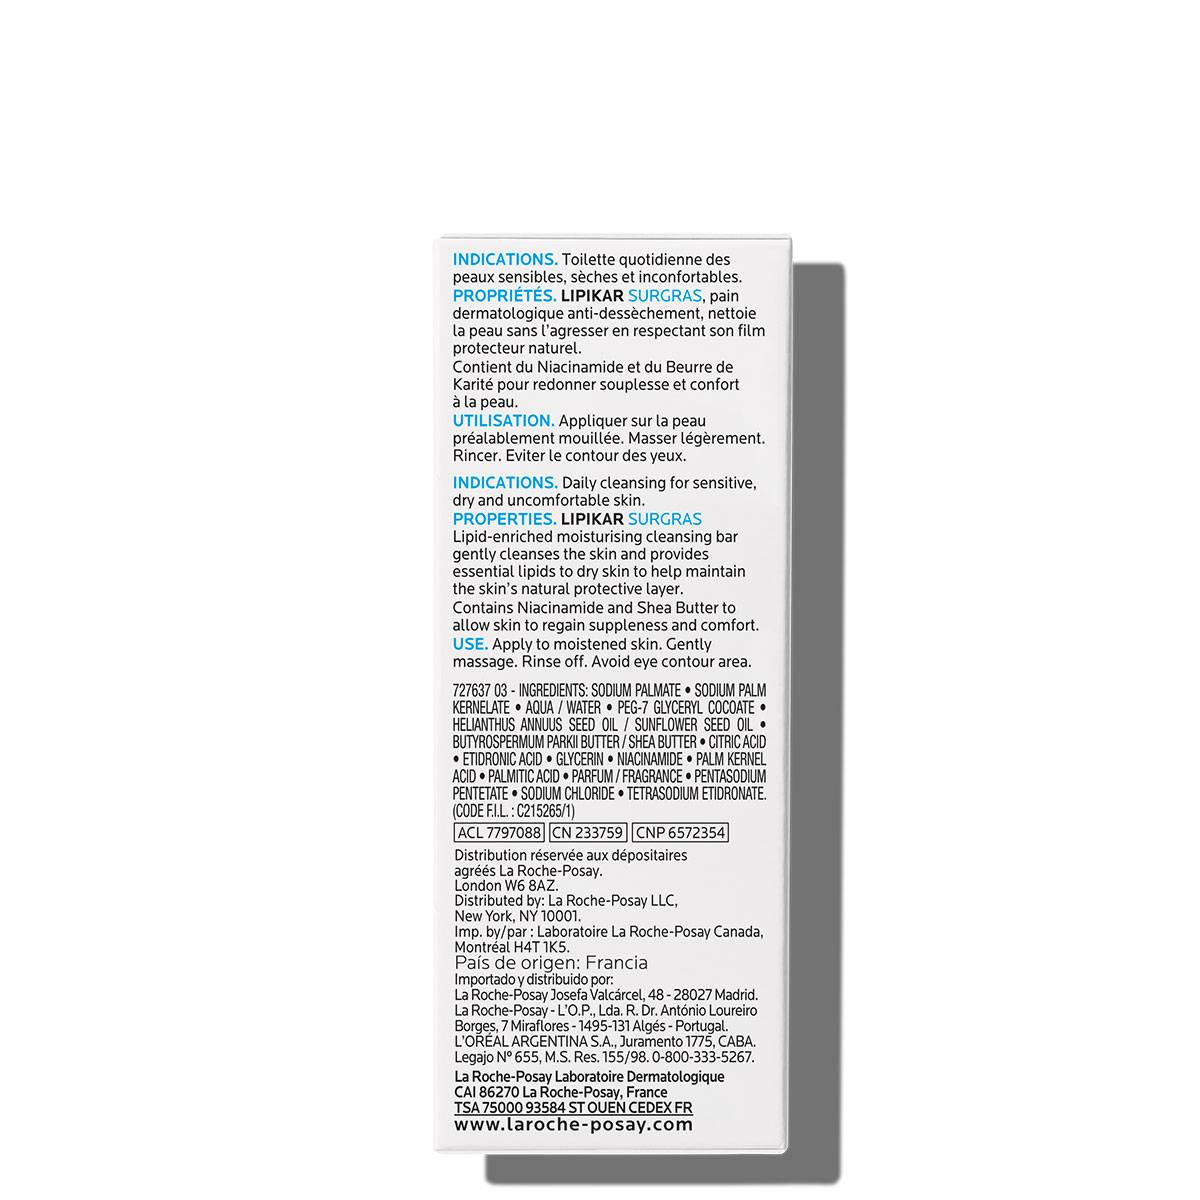 La Roche Posay Body Cleanser Lipikar Pain Surgras 150g 3433422404533 S